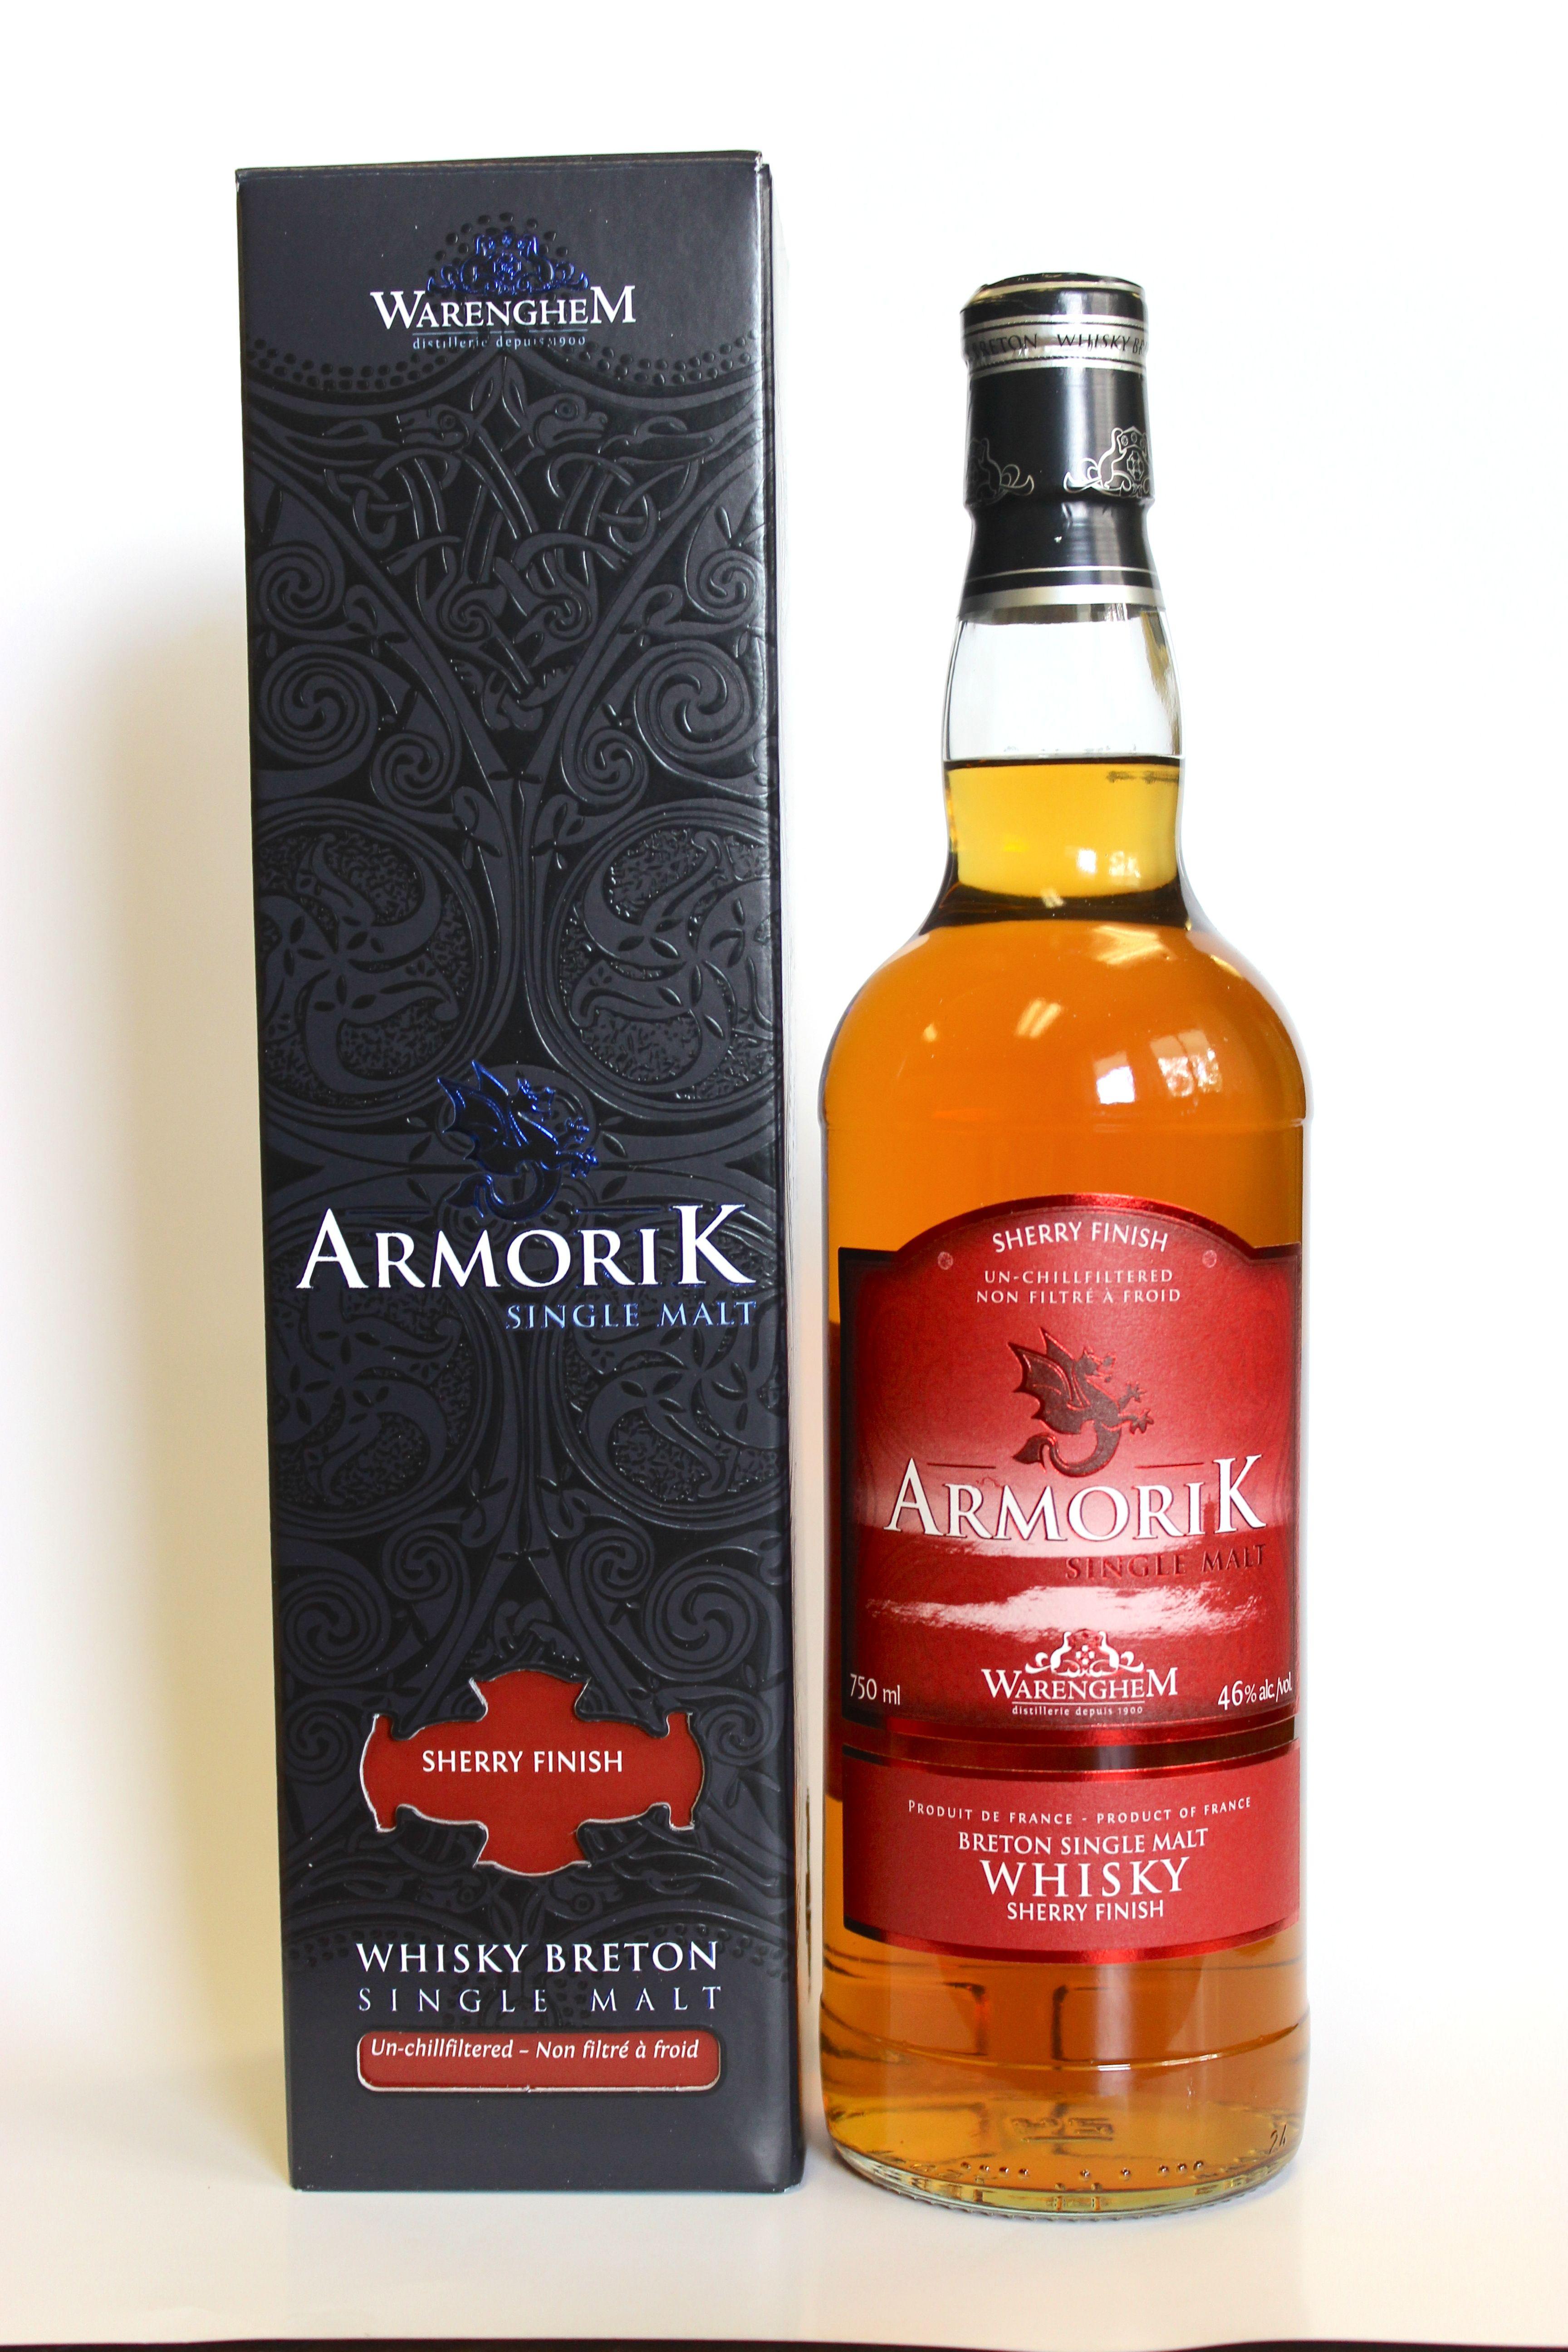 Armorik French Single Malt Whisky Sherry Finish Malt Whisky